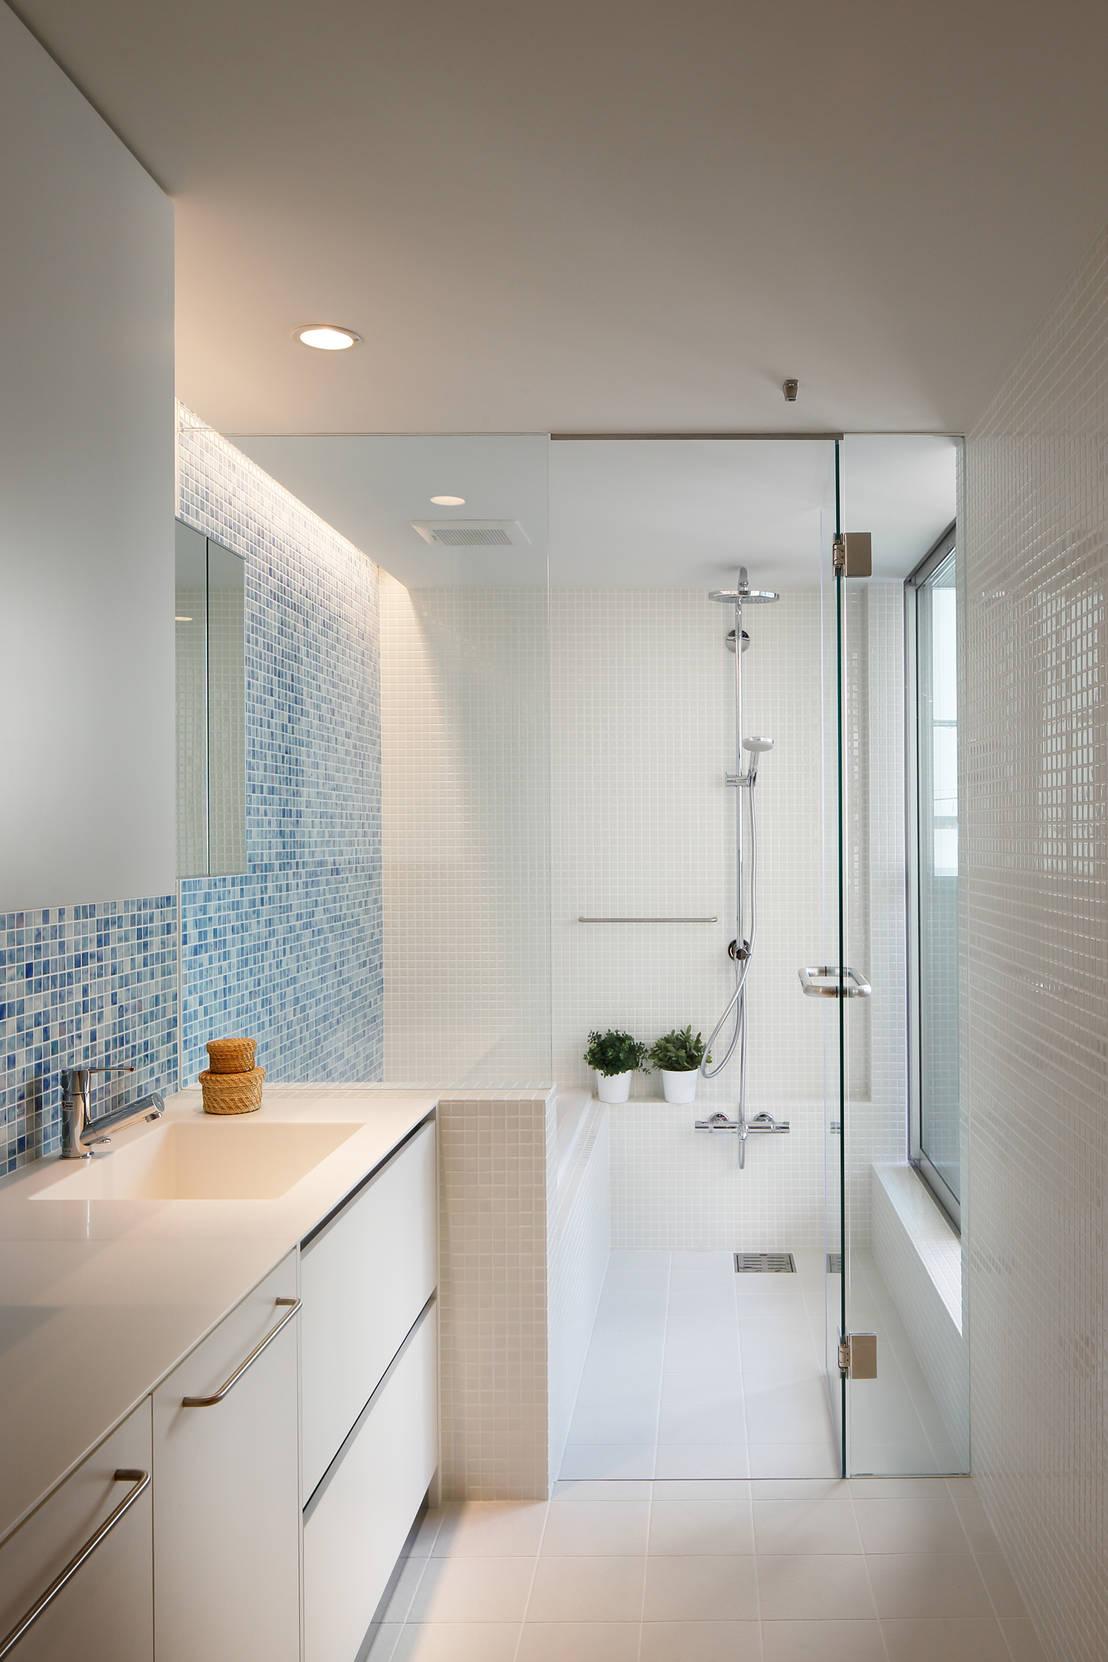 7 brilliant bathroom tiling ideas for your home